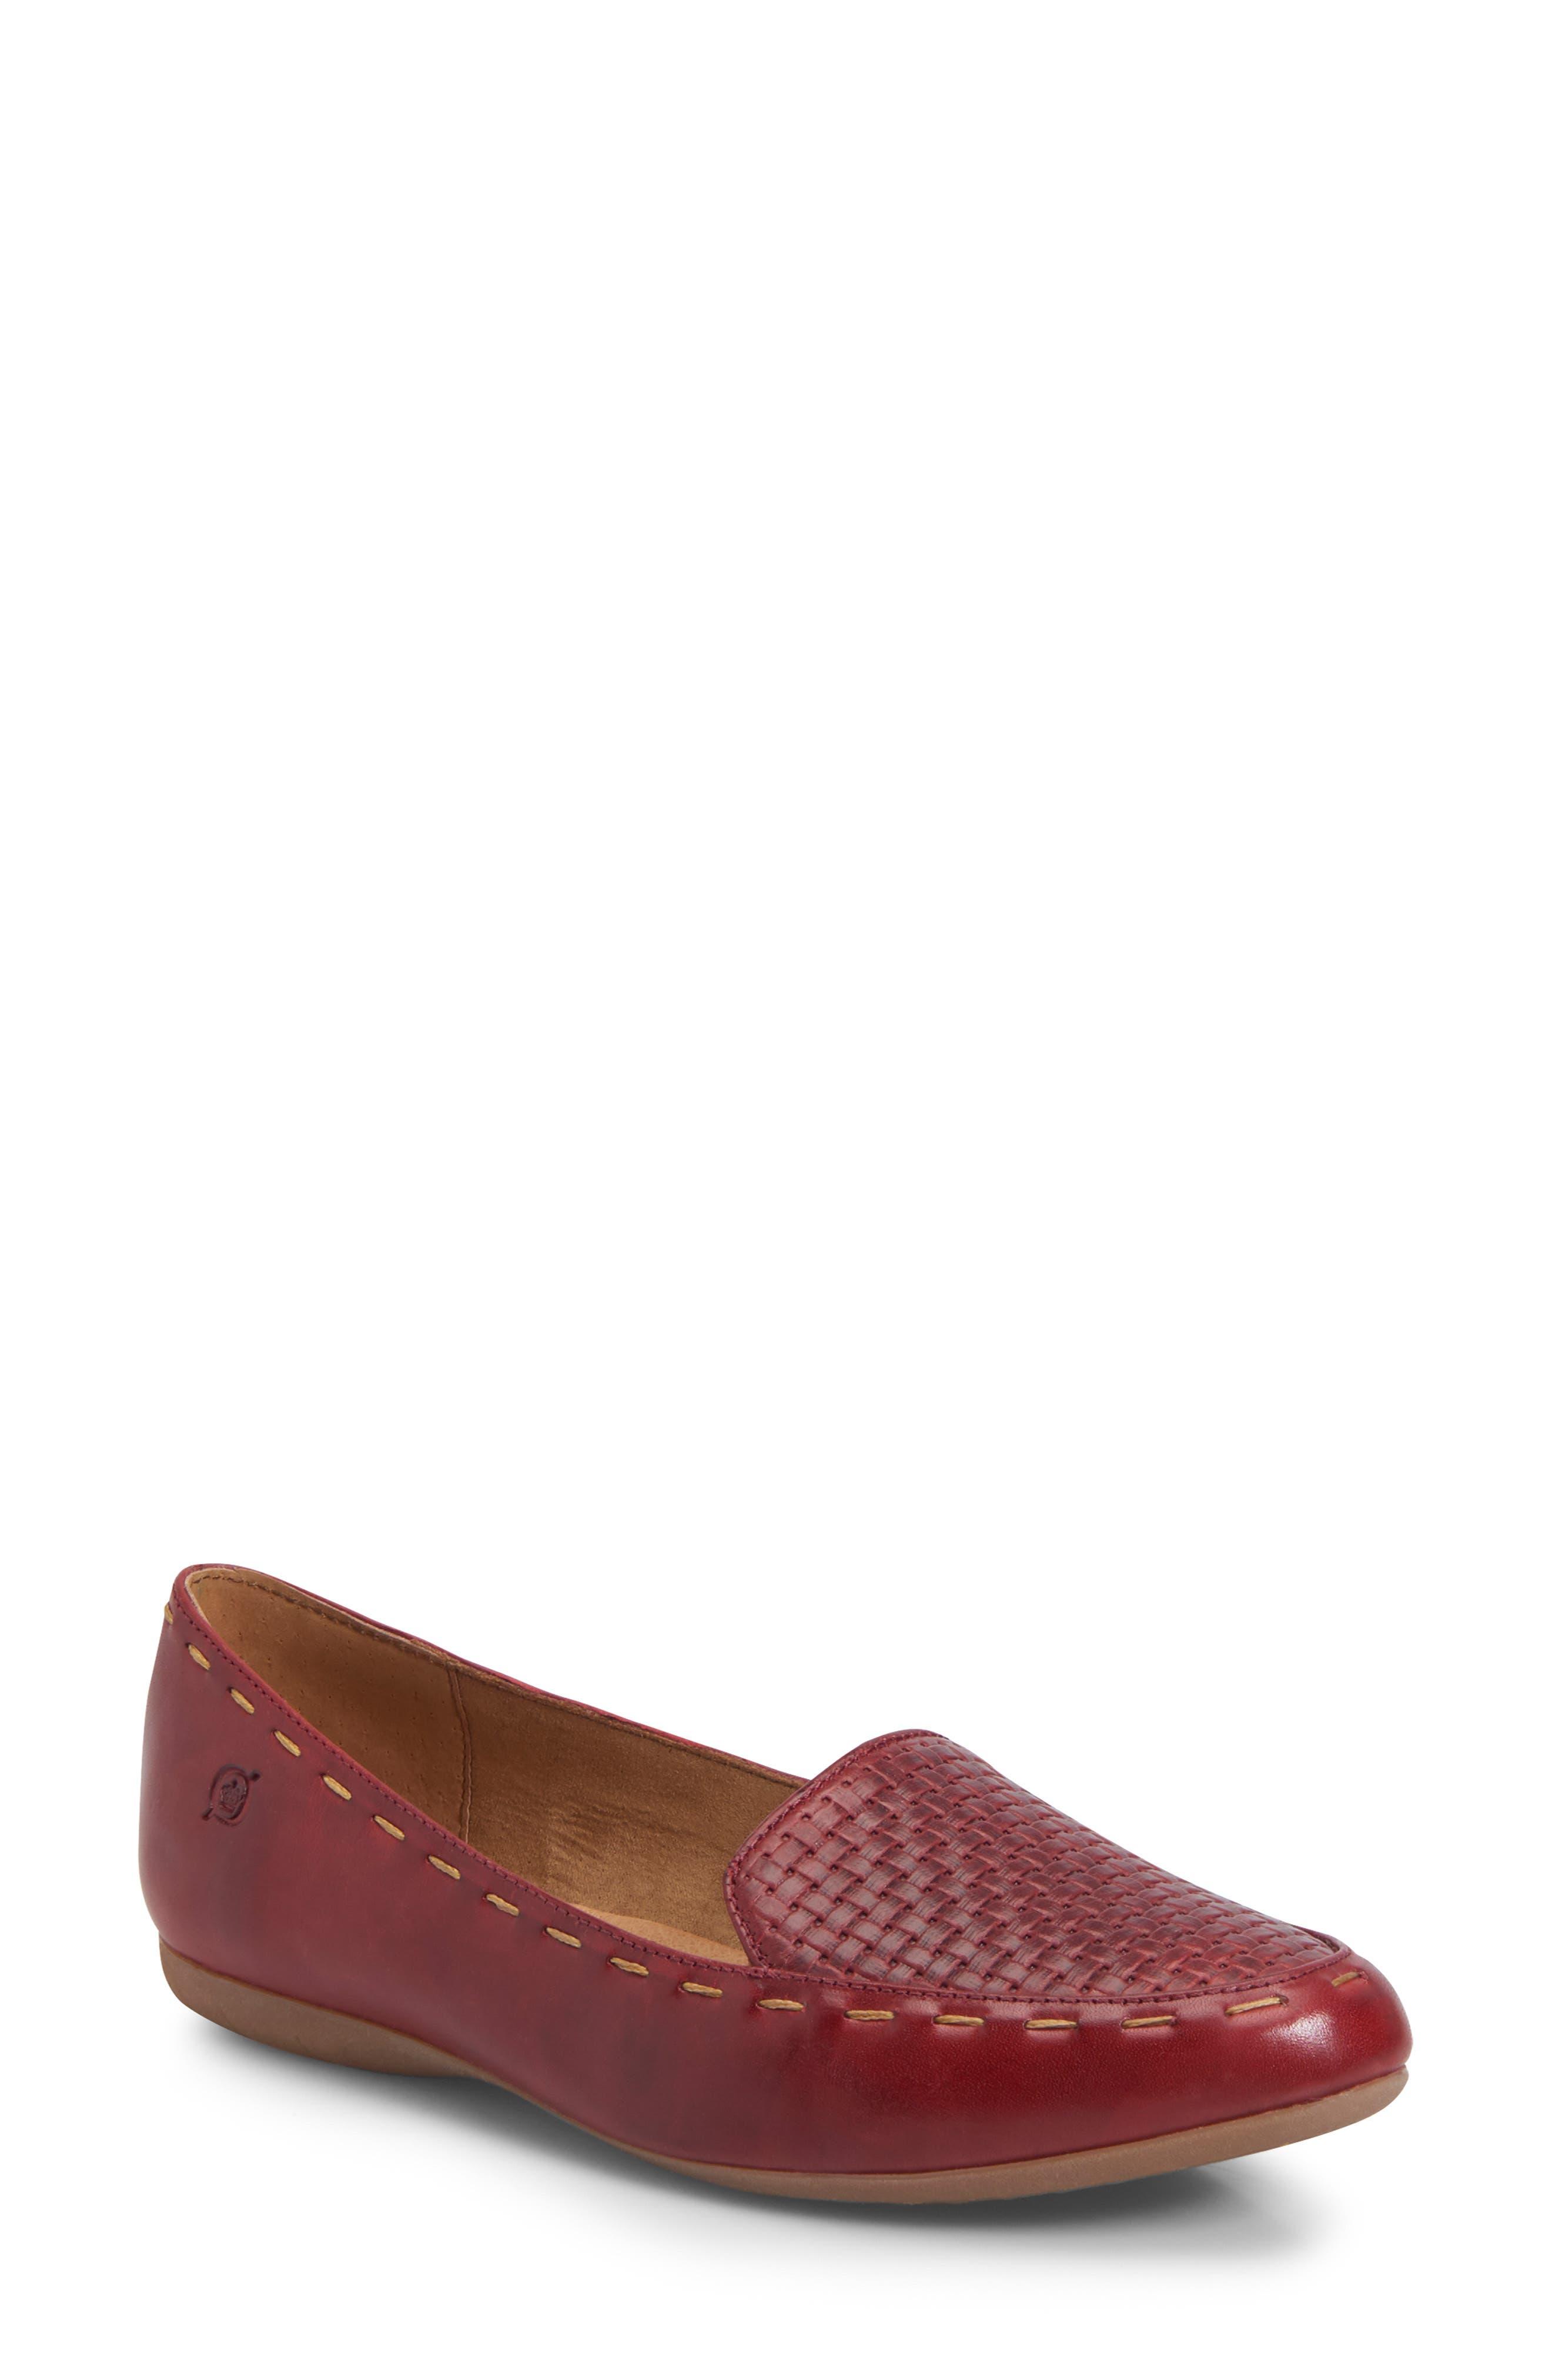 cc570a23c5f B rn Maple Flat- Red